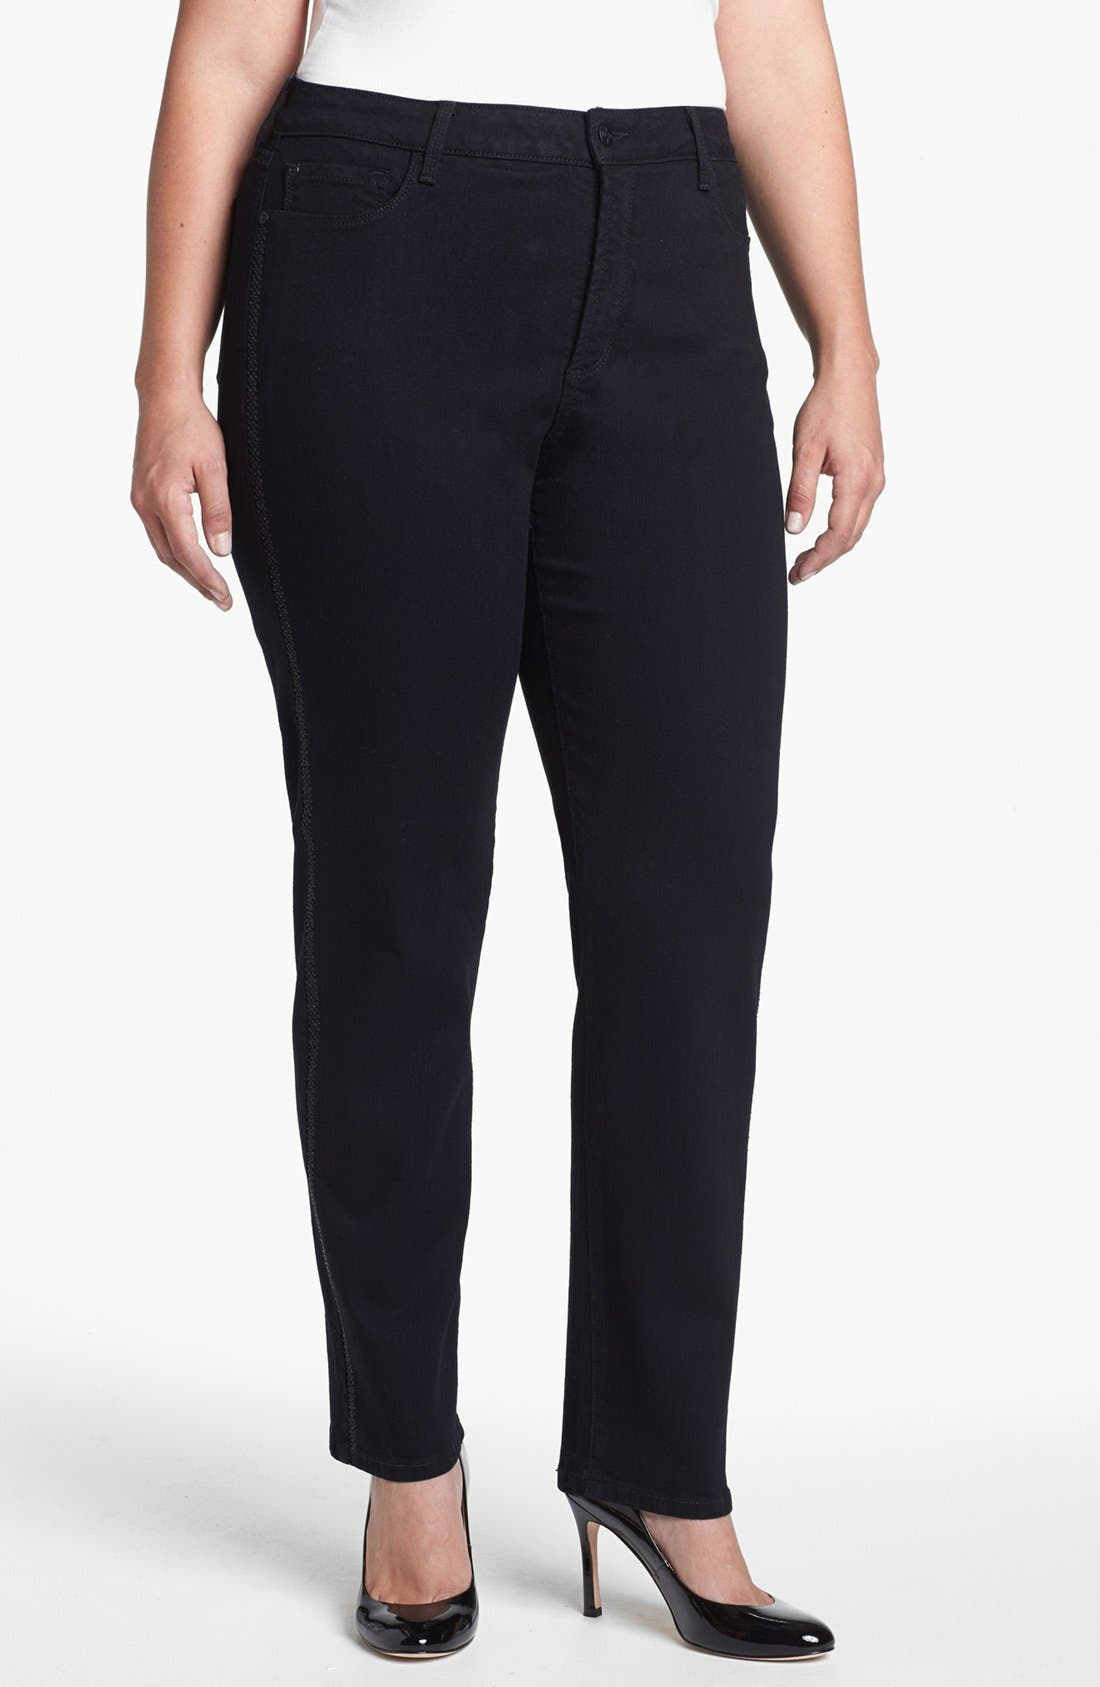 Main Image - NYDJ 'Sheri' Embellished Trim Stretch Skinny Jeans (Plus Size)